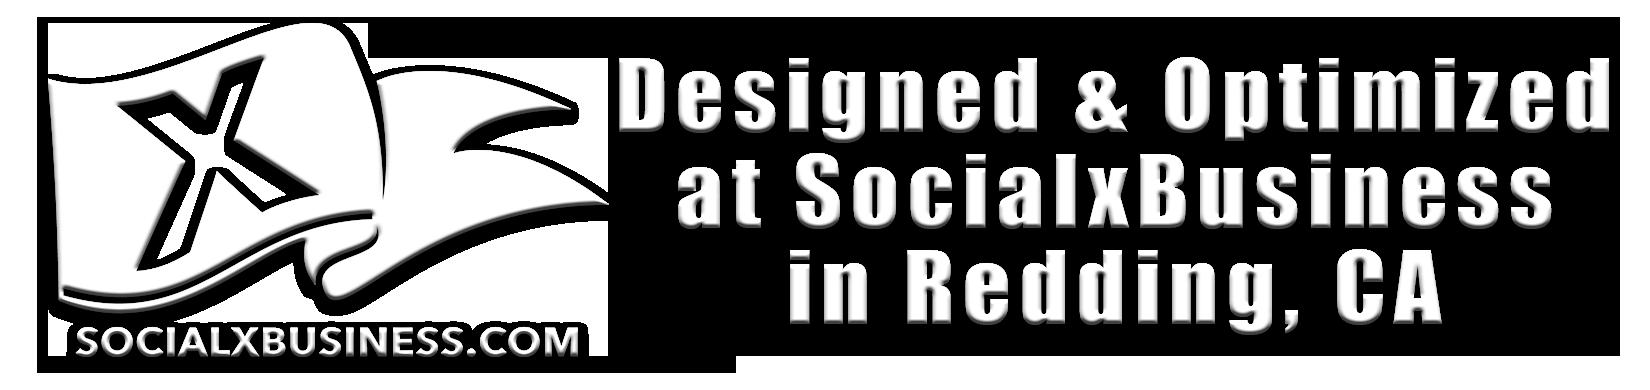 SocialxBusiness Website Design & Optimization.jpg